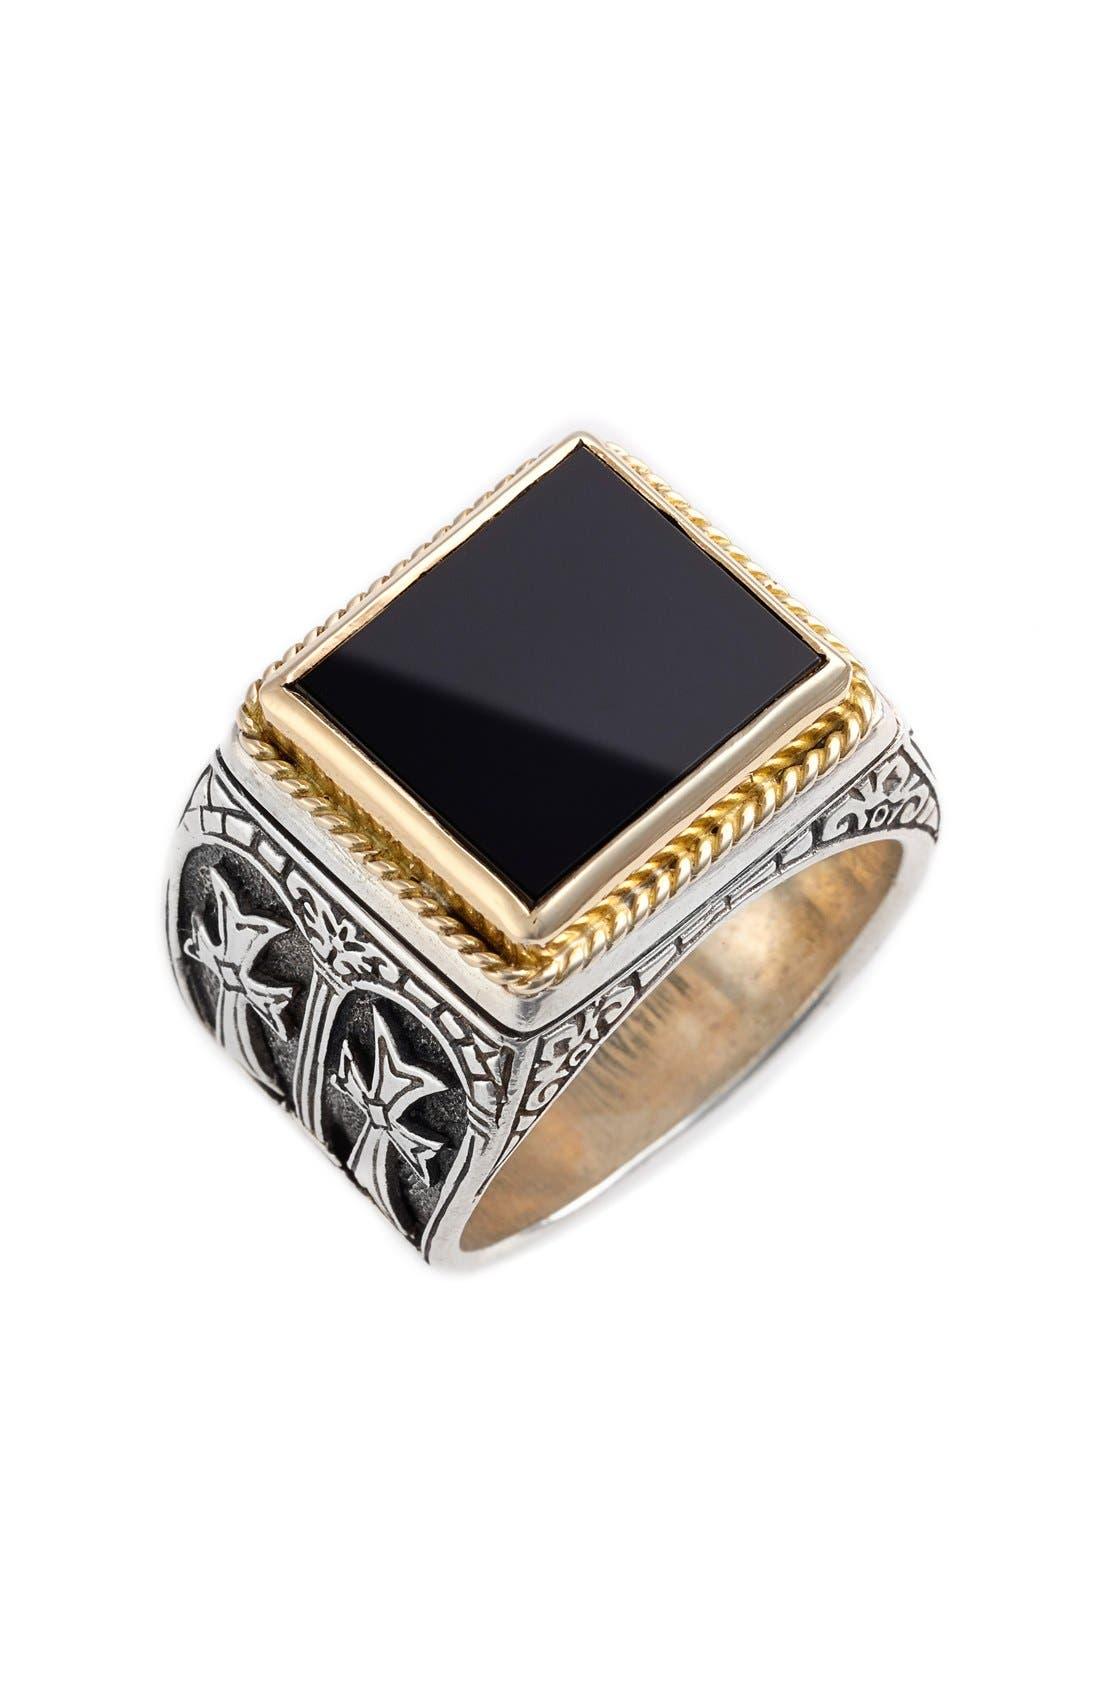 'Minos' Side Cross Ring,                             Main thumbnail 1, color,                             SILVER/ GOLD/ BLACK ONYX